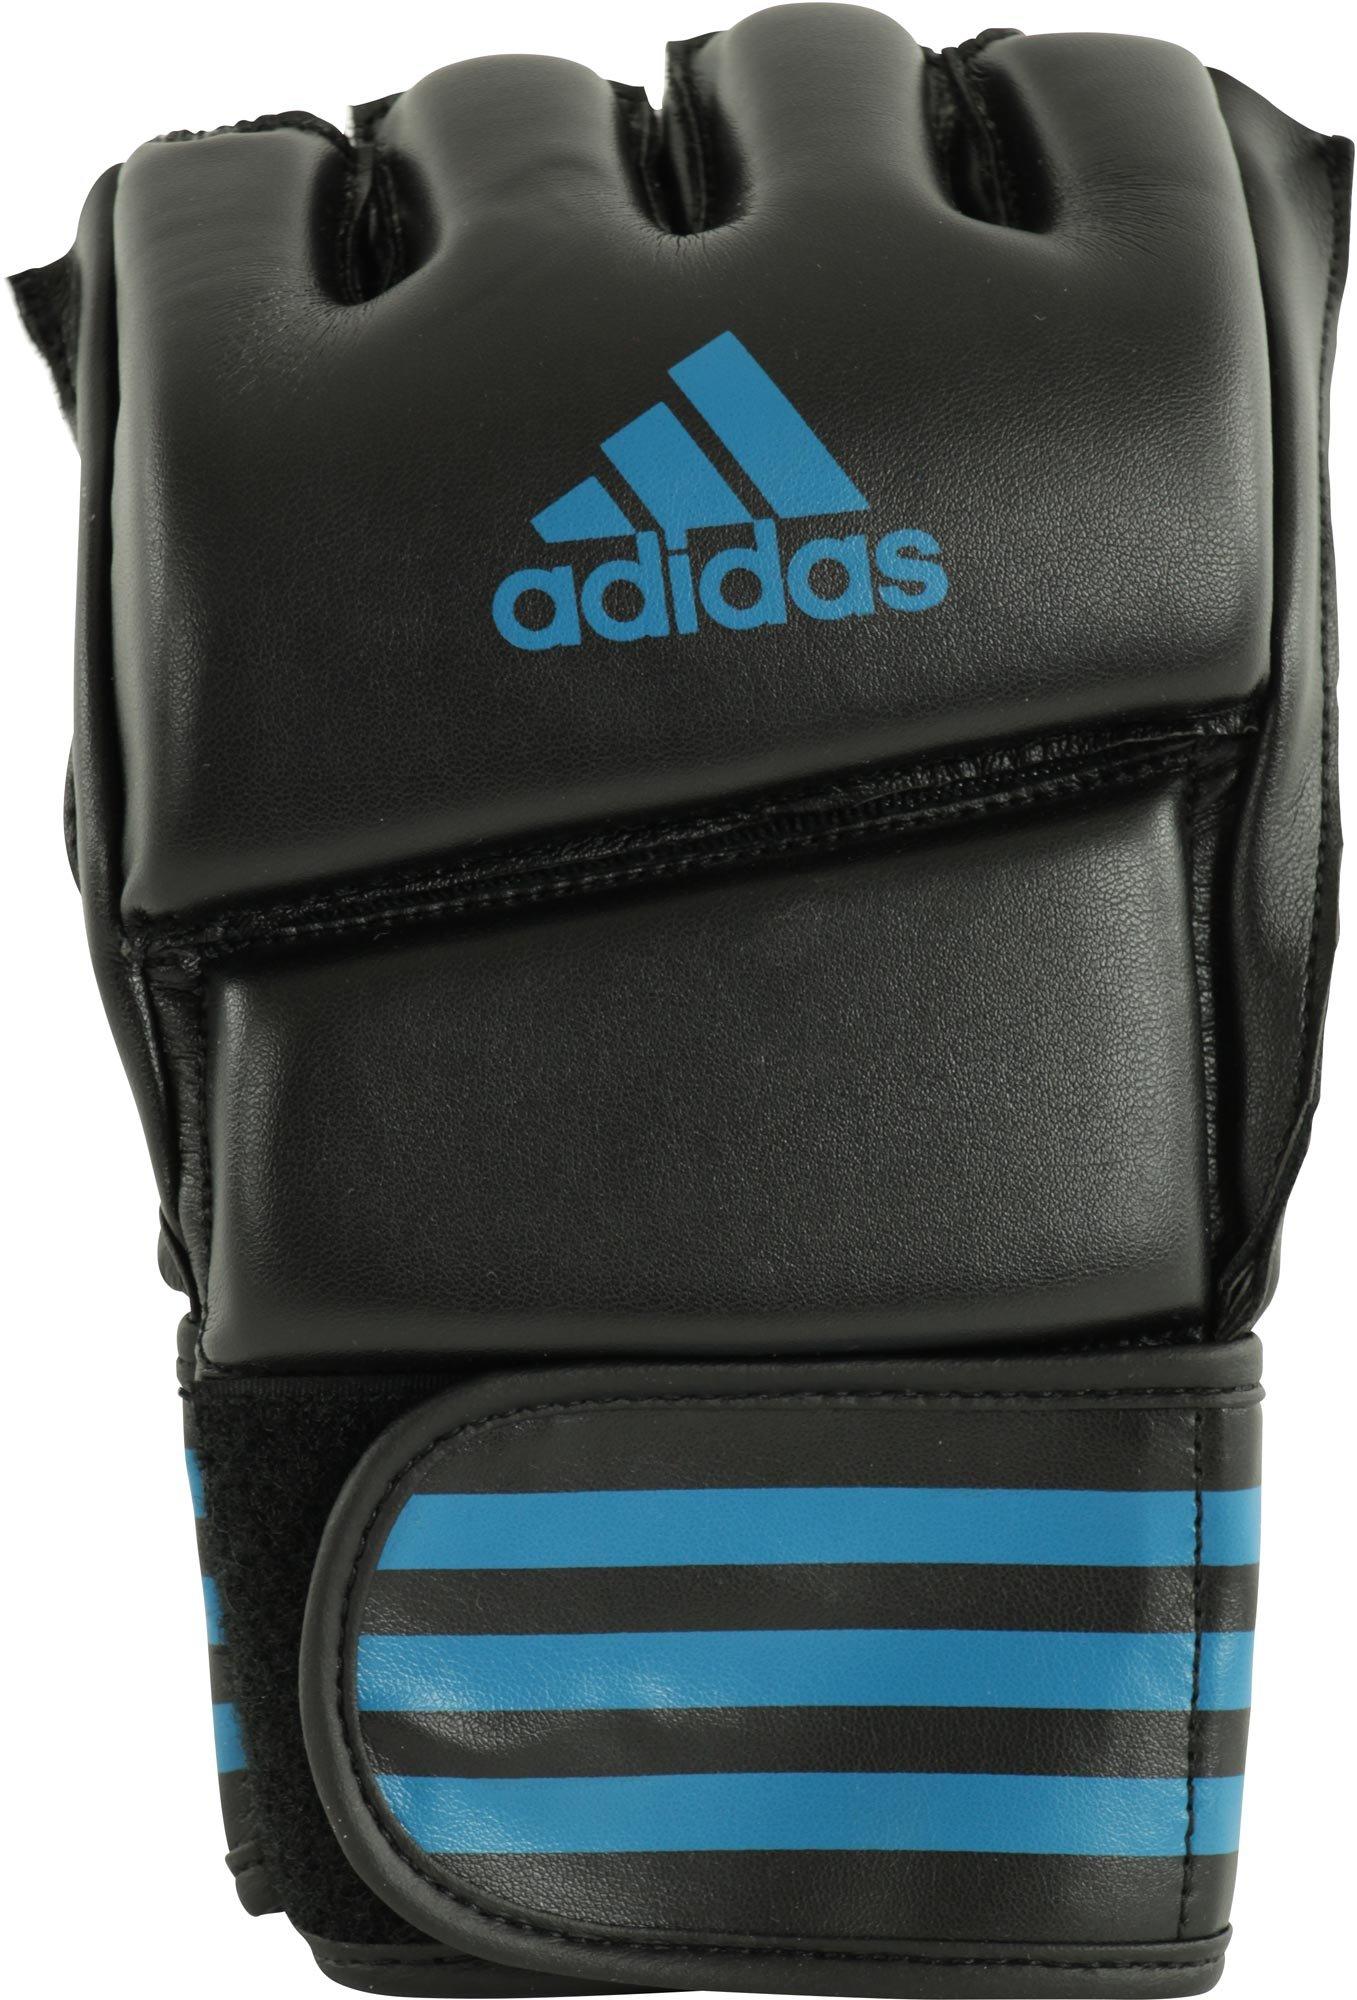 Adidas Grappling Training Glove XL